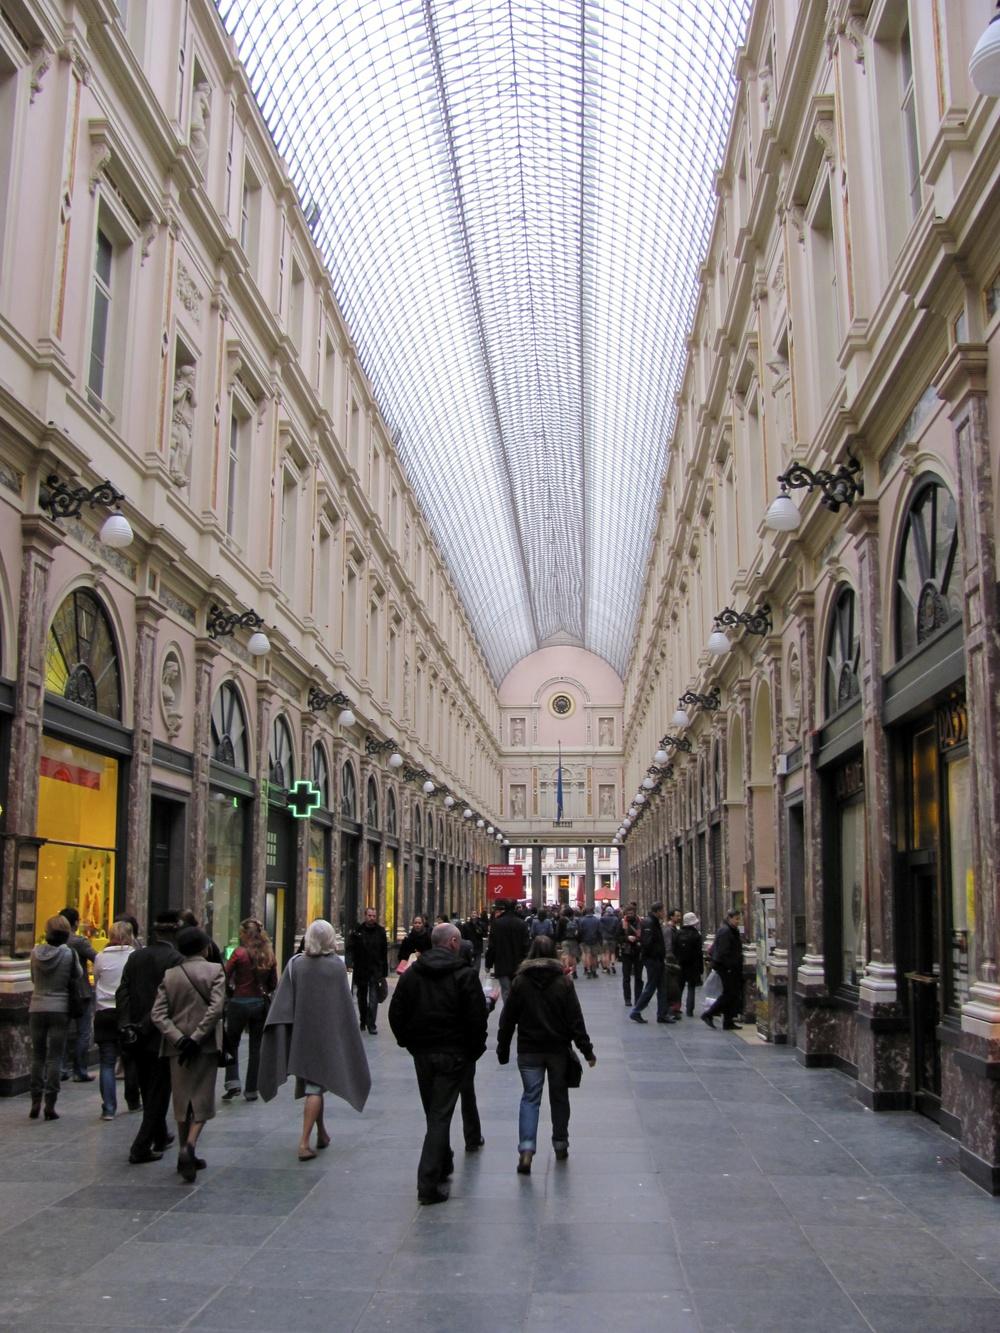 Galeries Royales St. Hubert, Brussels Old City, Belgium, VHS 2010